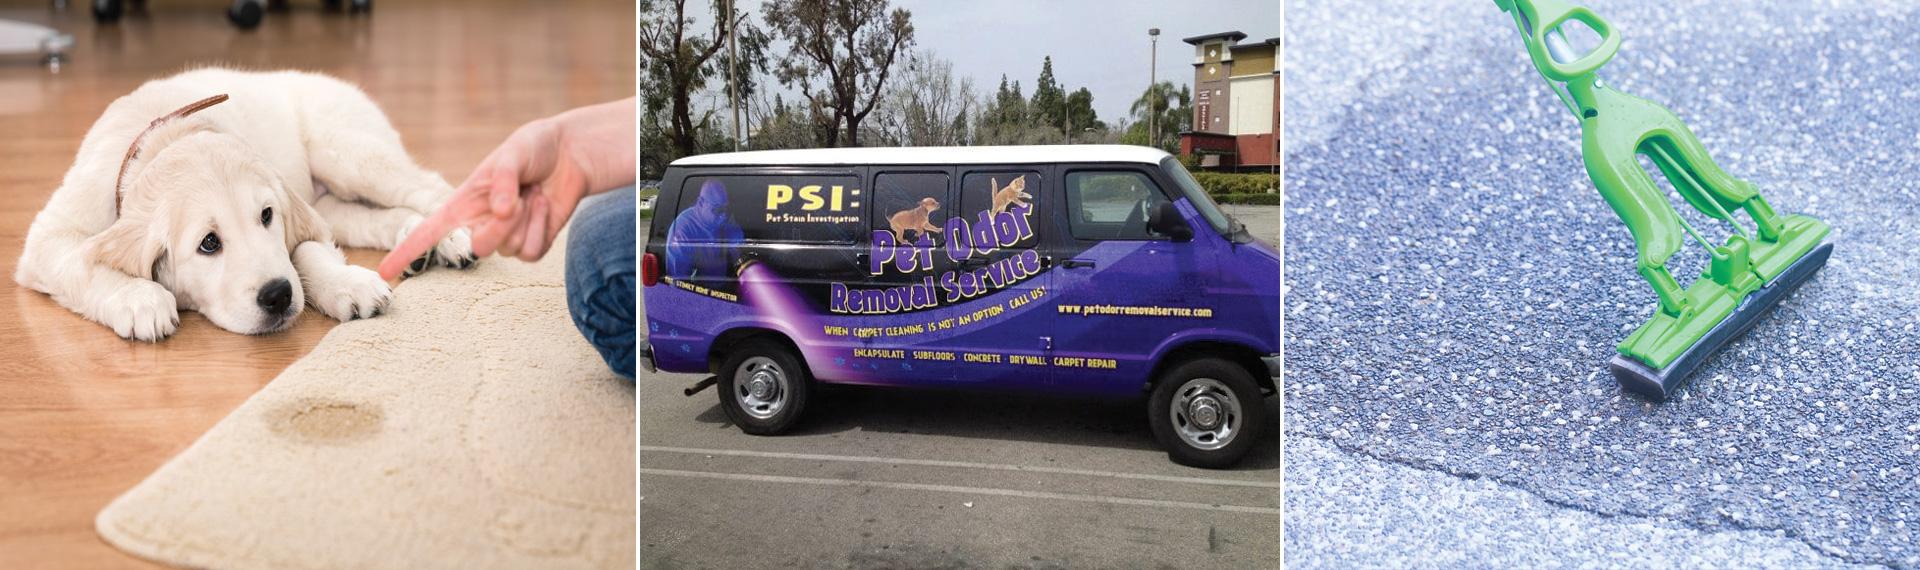 Pet Odor Removal Service Dana Point CA